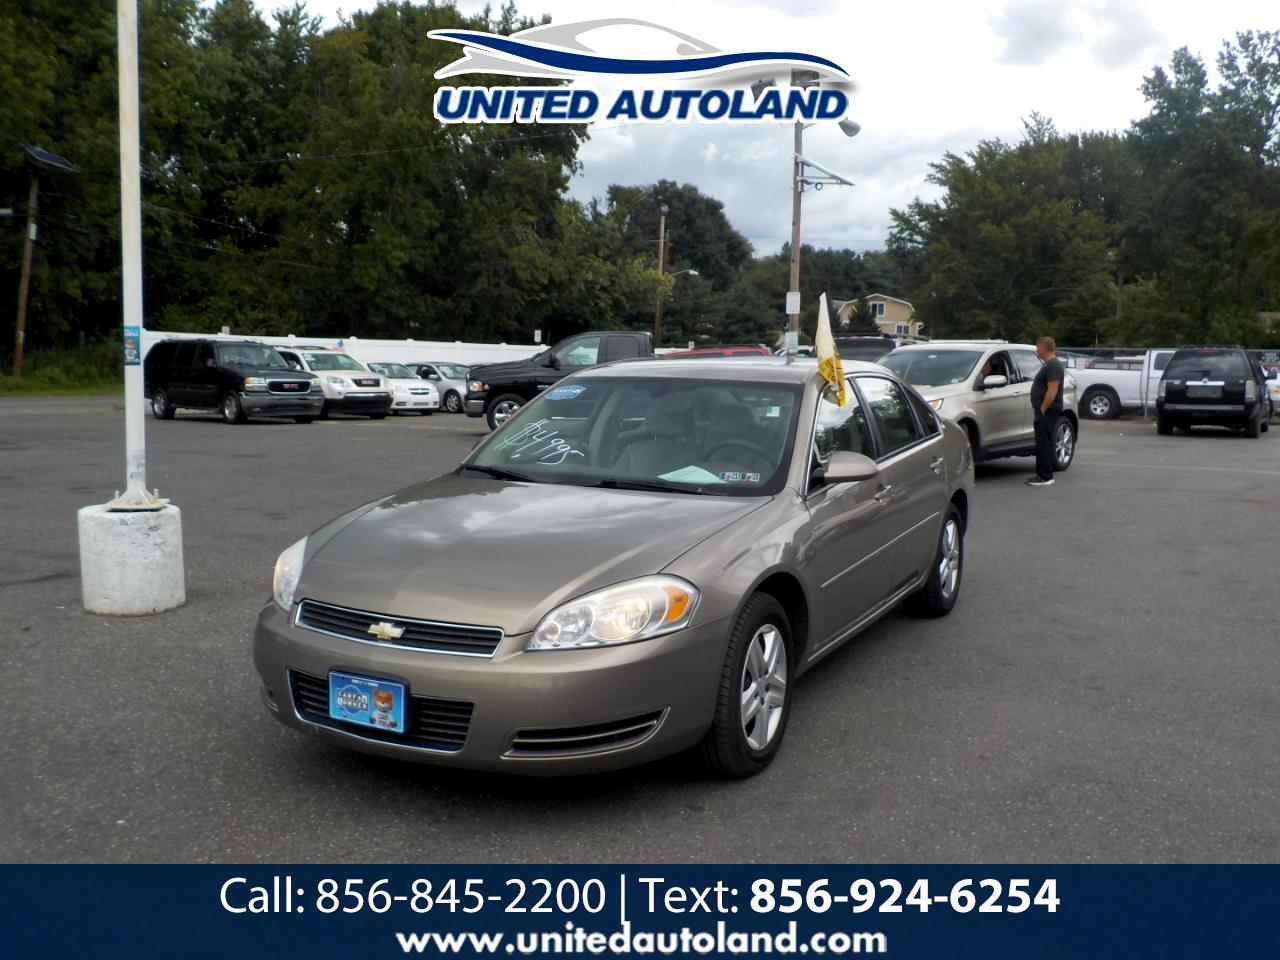 Chevrolet Impala 4dr Sdn LT 3.5L 2006